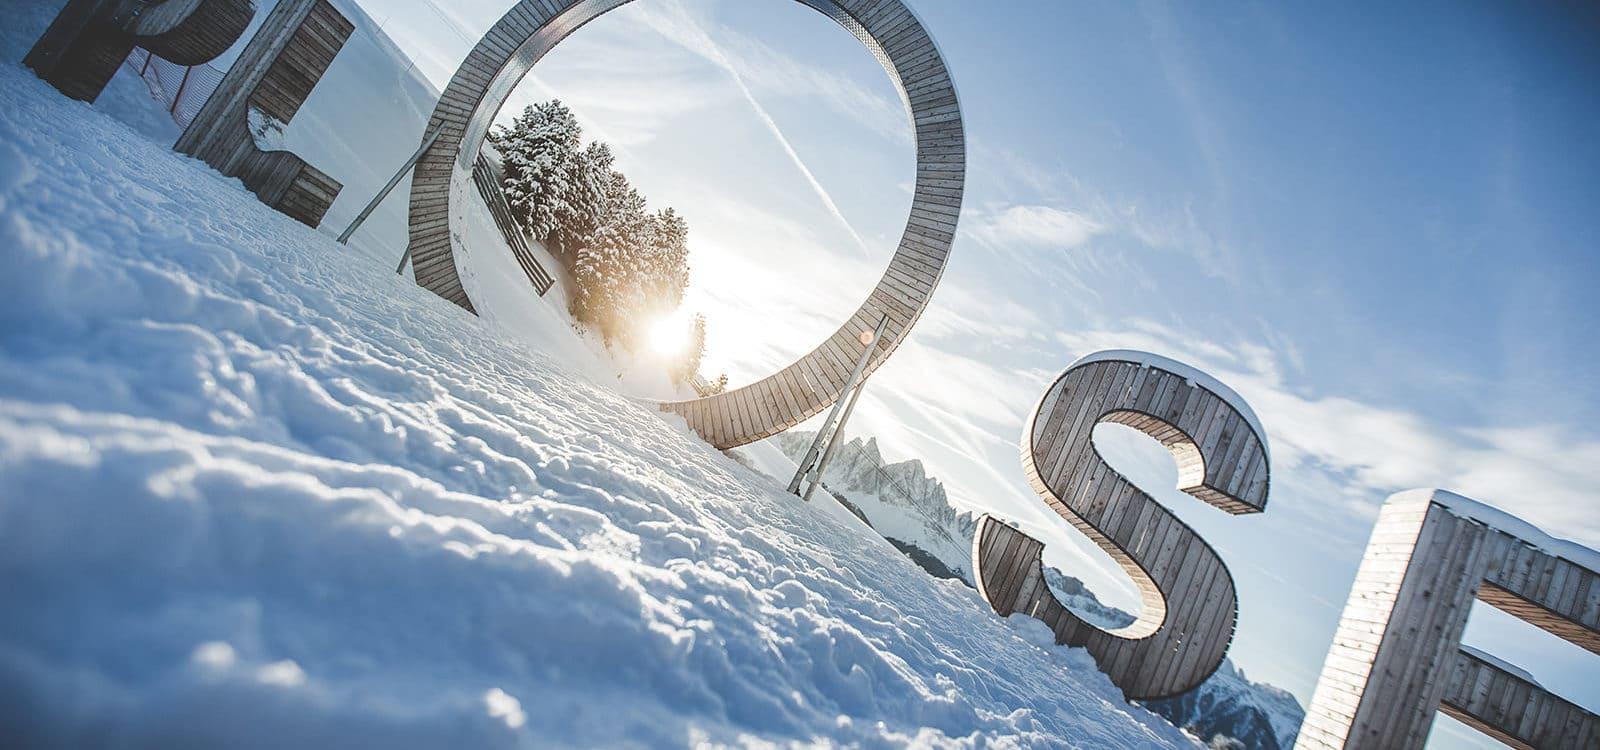 Gerharts - Brixen skiing days